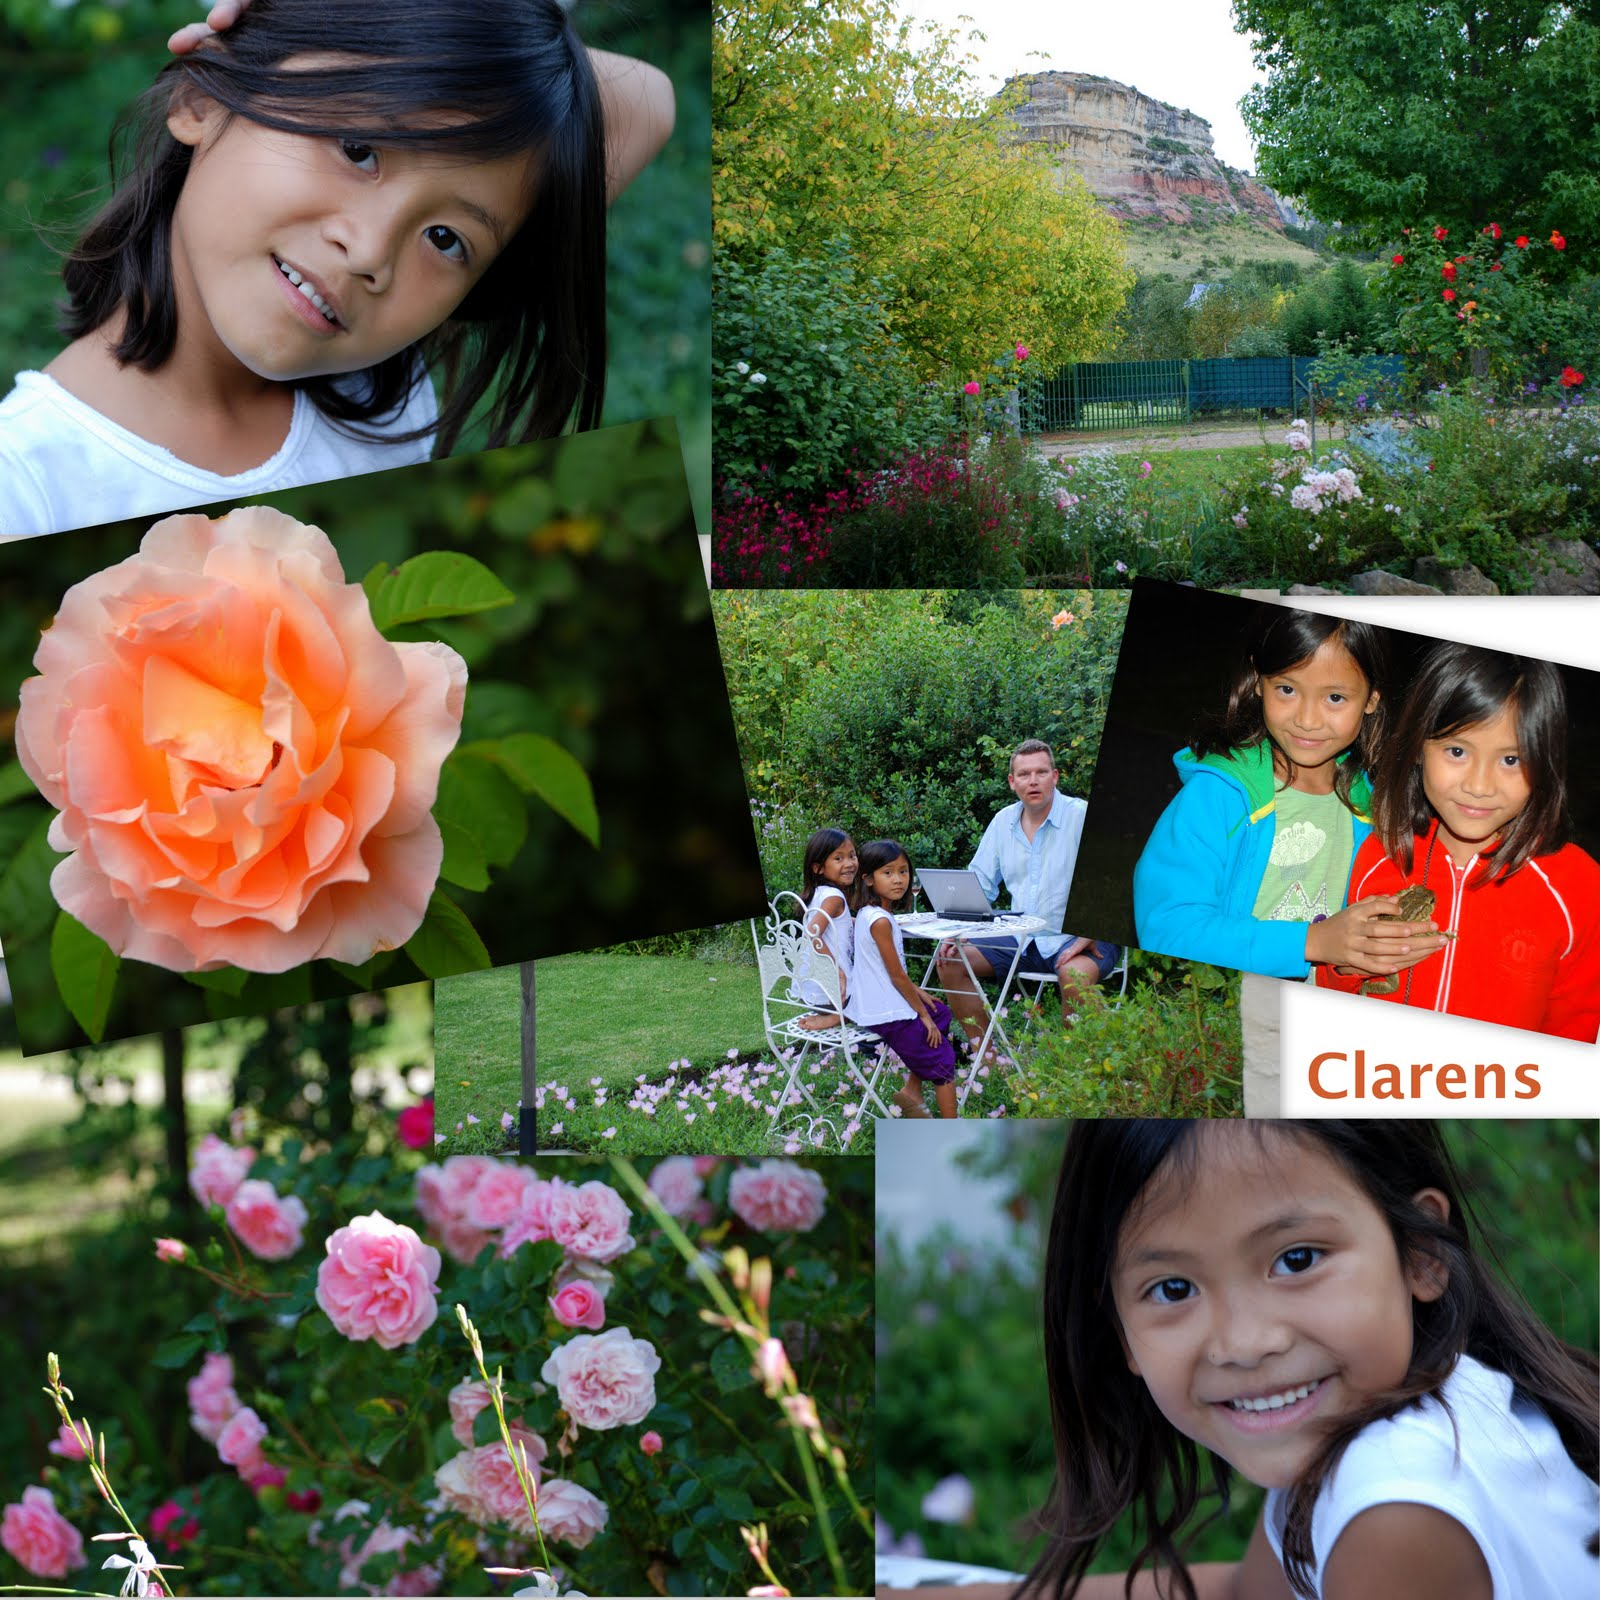 http://4.bp.blogspot.com/_5tFf6vwe0W0/S6nkztuGp2I/AAAAAAAADYw/MOmr13lWAdE/s1600/ClarensMosaic.jpg